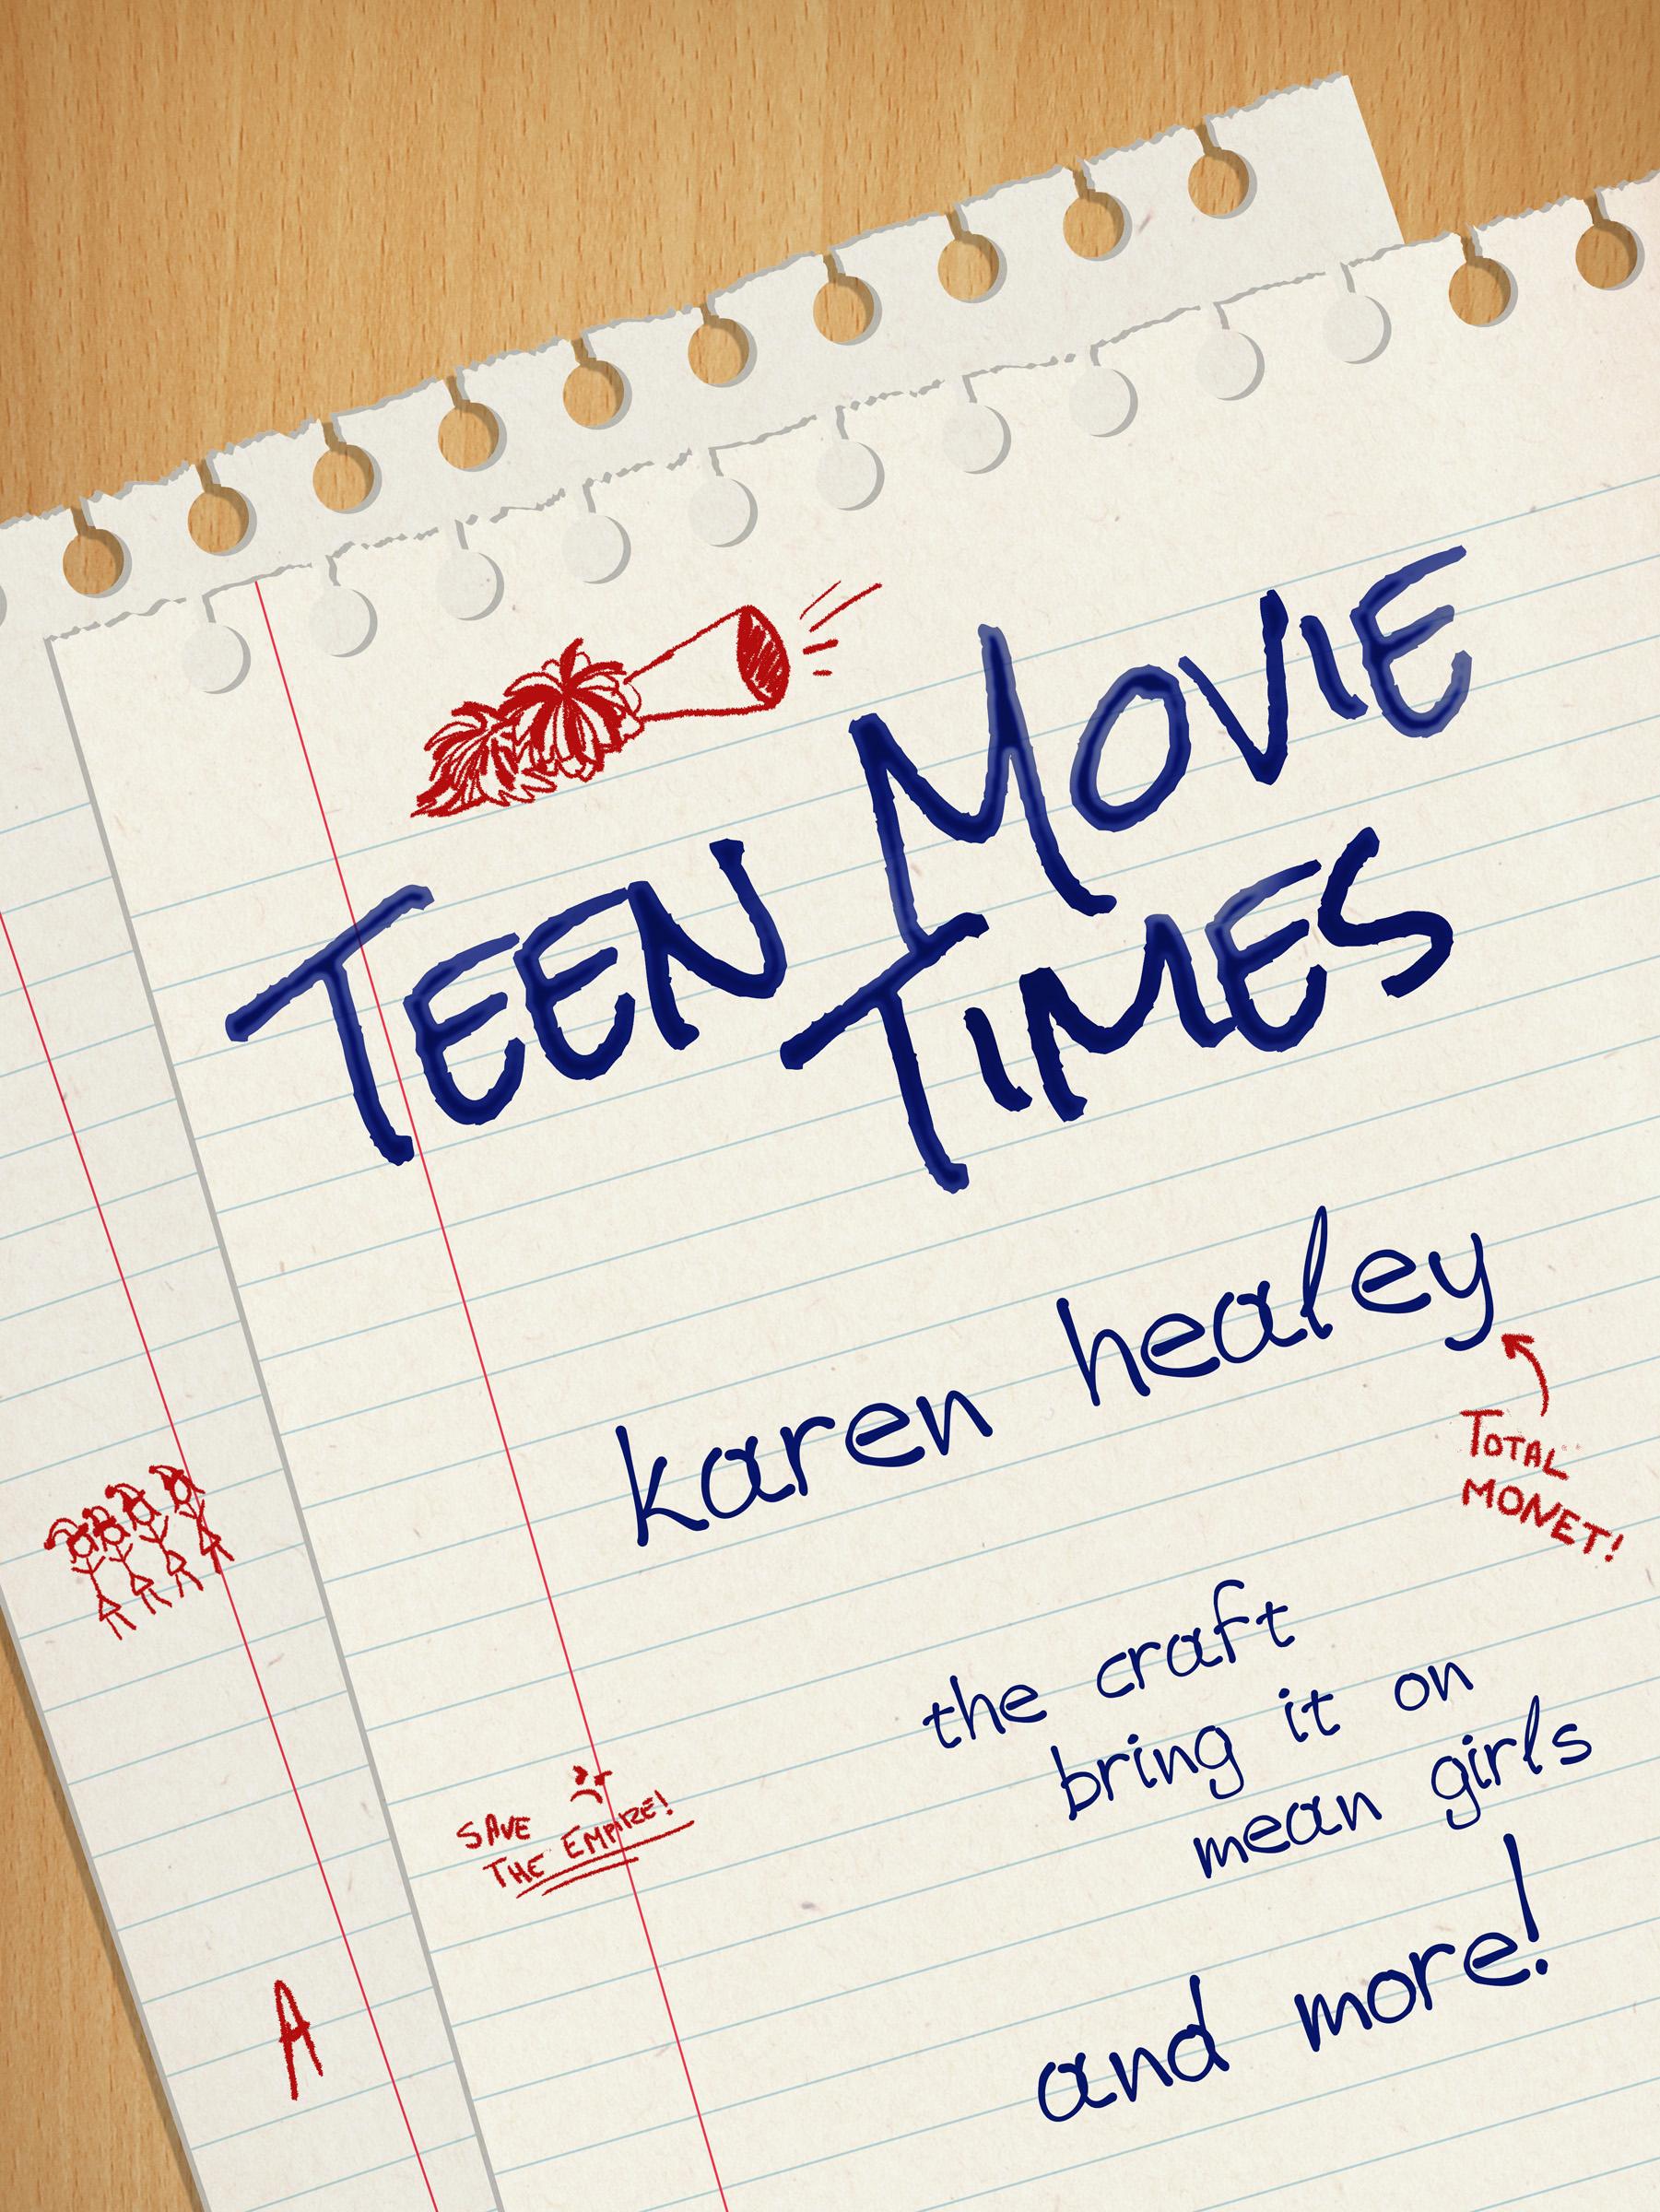 Teen Movie Times